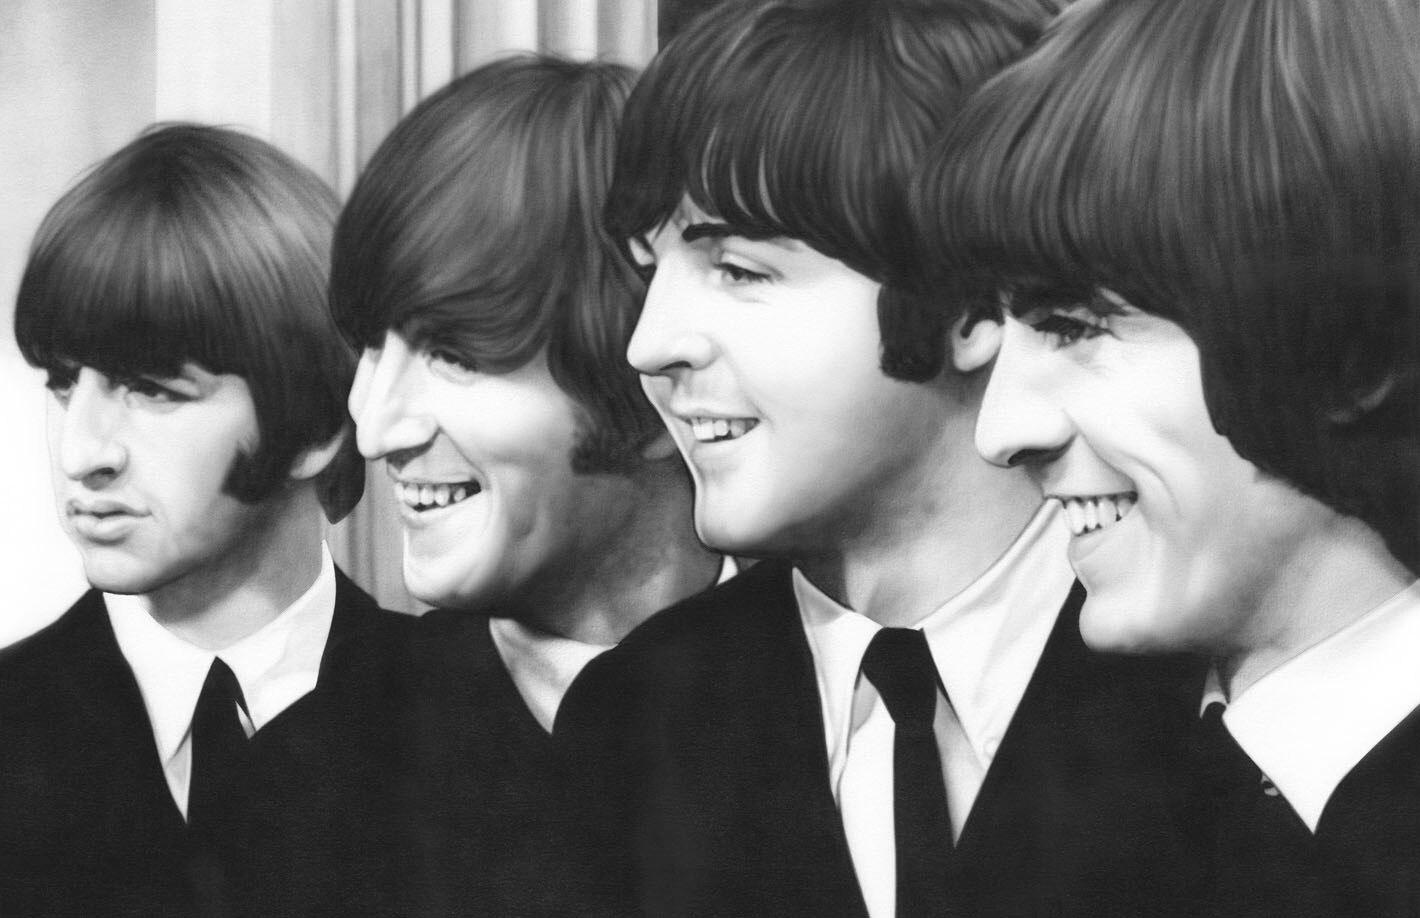 The-Beatles-George-Harrison-Ringo-Starr-Paul-McCartney-John-Lennon-Poster-Home-Decor-Wall-Sticker-4